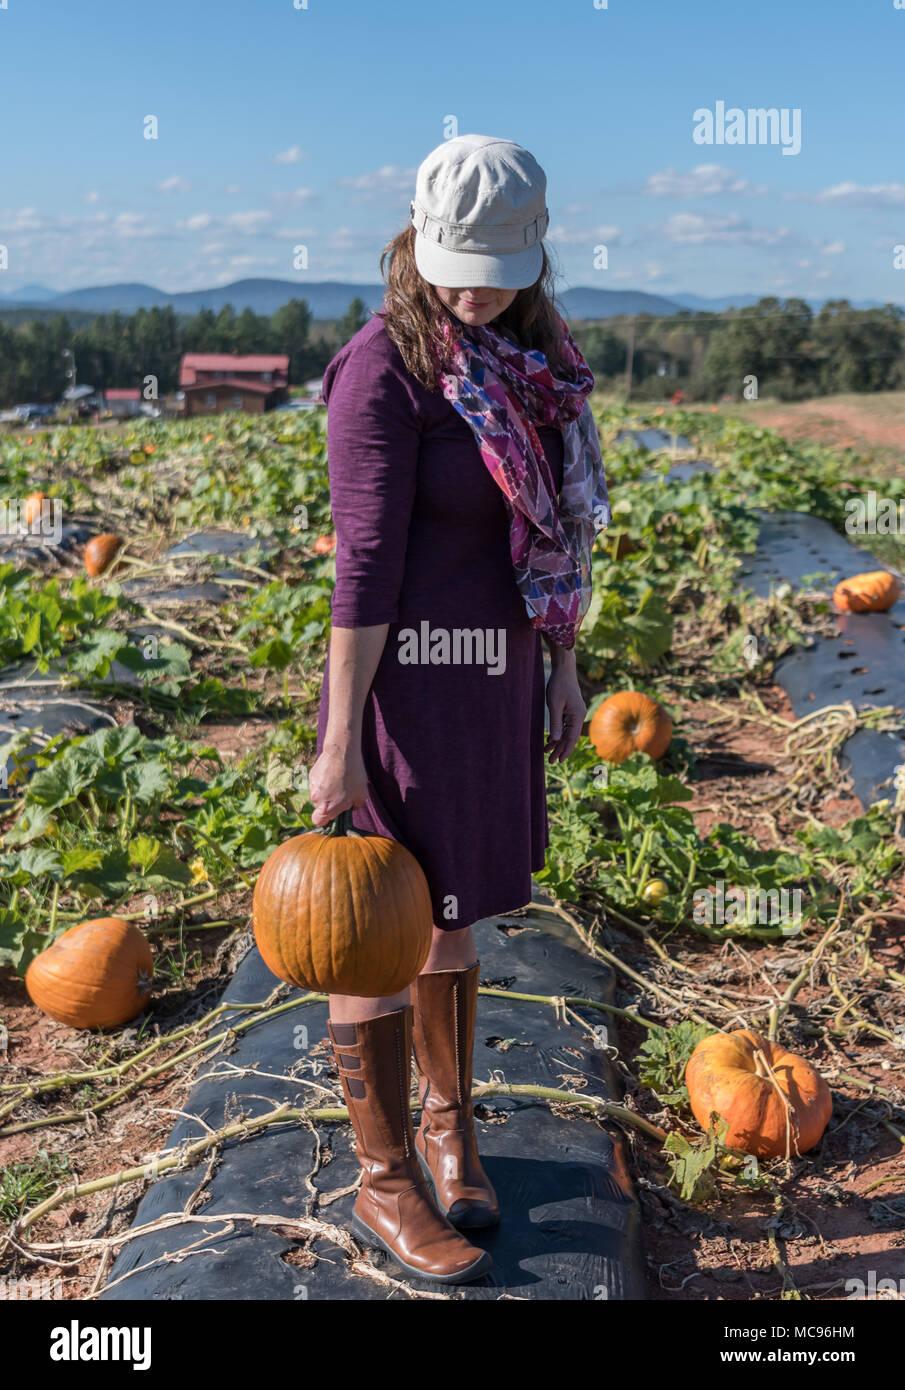 Woman Swings Pumpkin on Sunny Afternoon in pumpkin patch - Stock Image